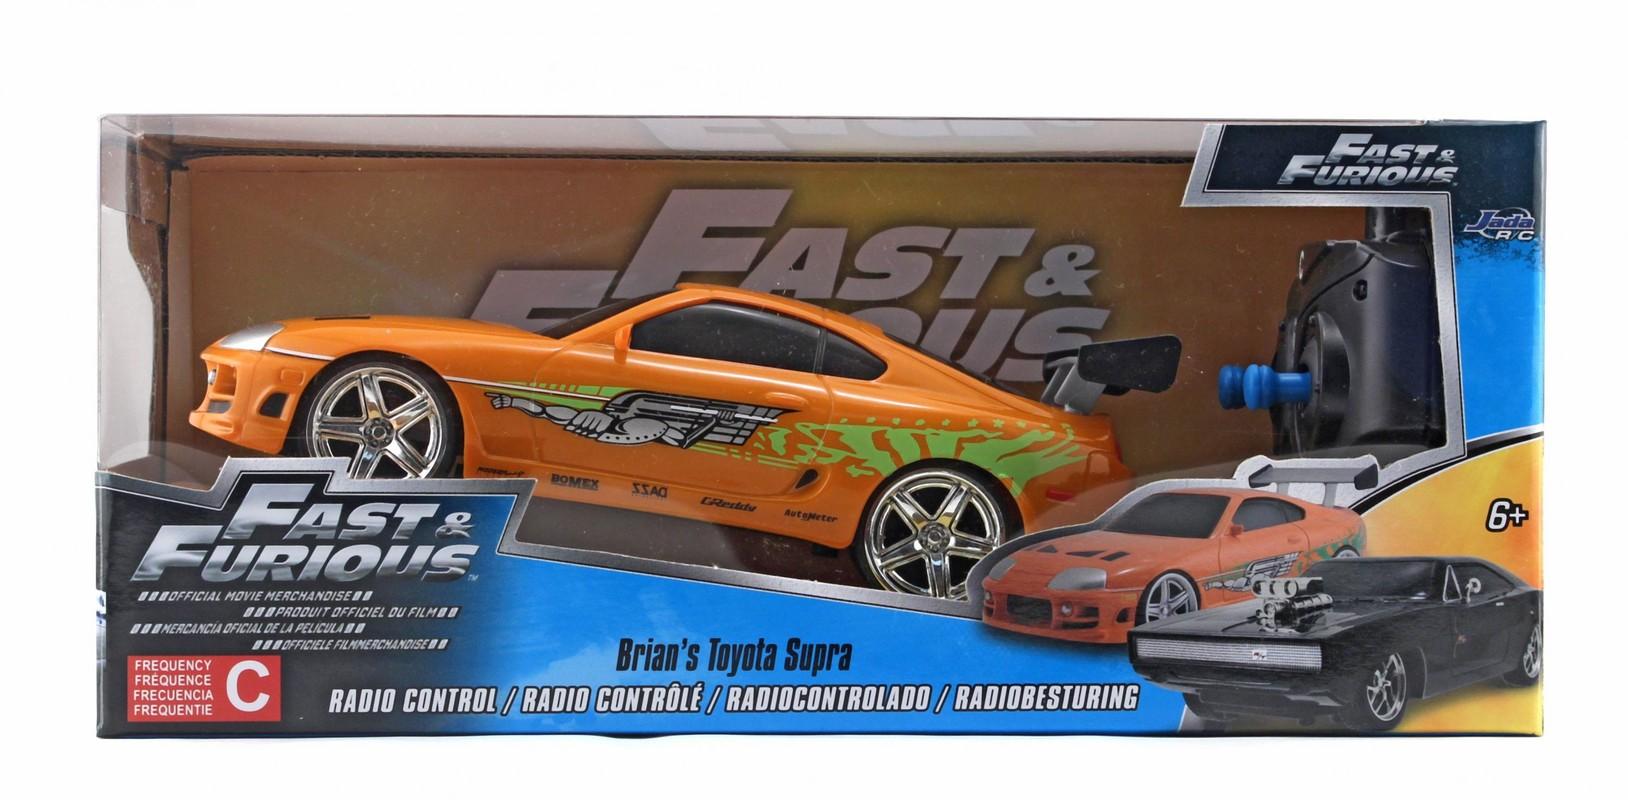 JADA - Rýchlo A Zbesilo Rc Auto Brian'S Toyota 1:24